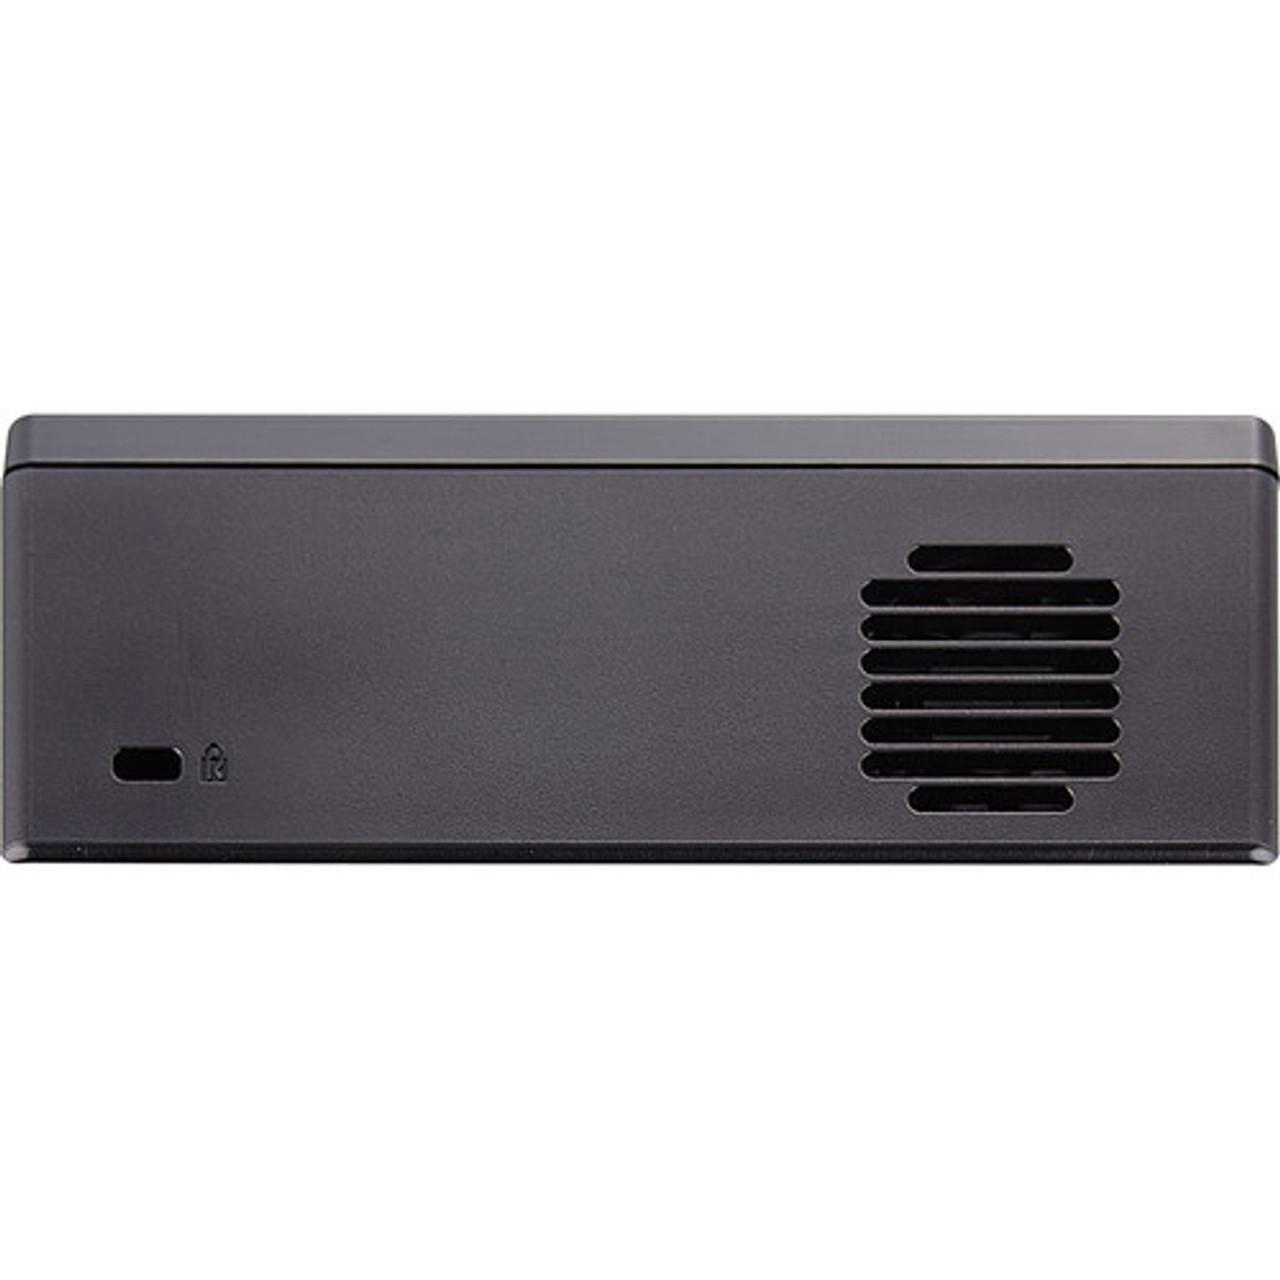 ViewSonic PLED-W800-R WXGA Ultra-portable LED Projector - C Grade Refurbished